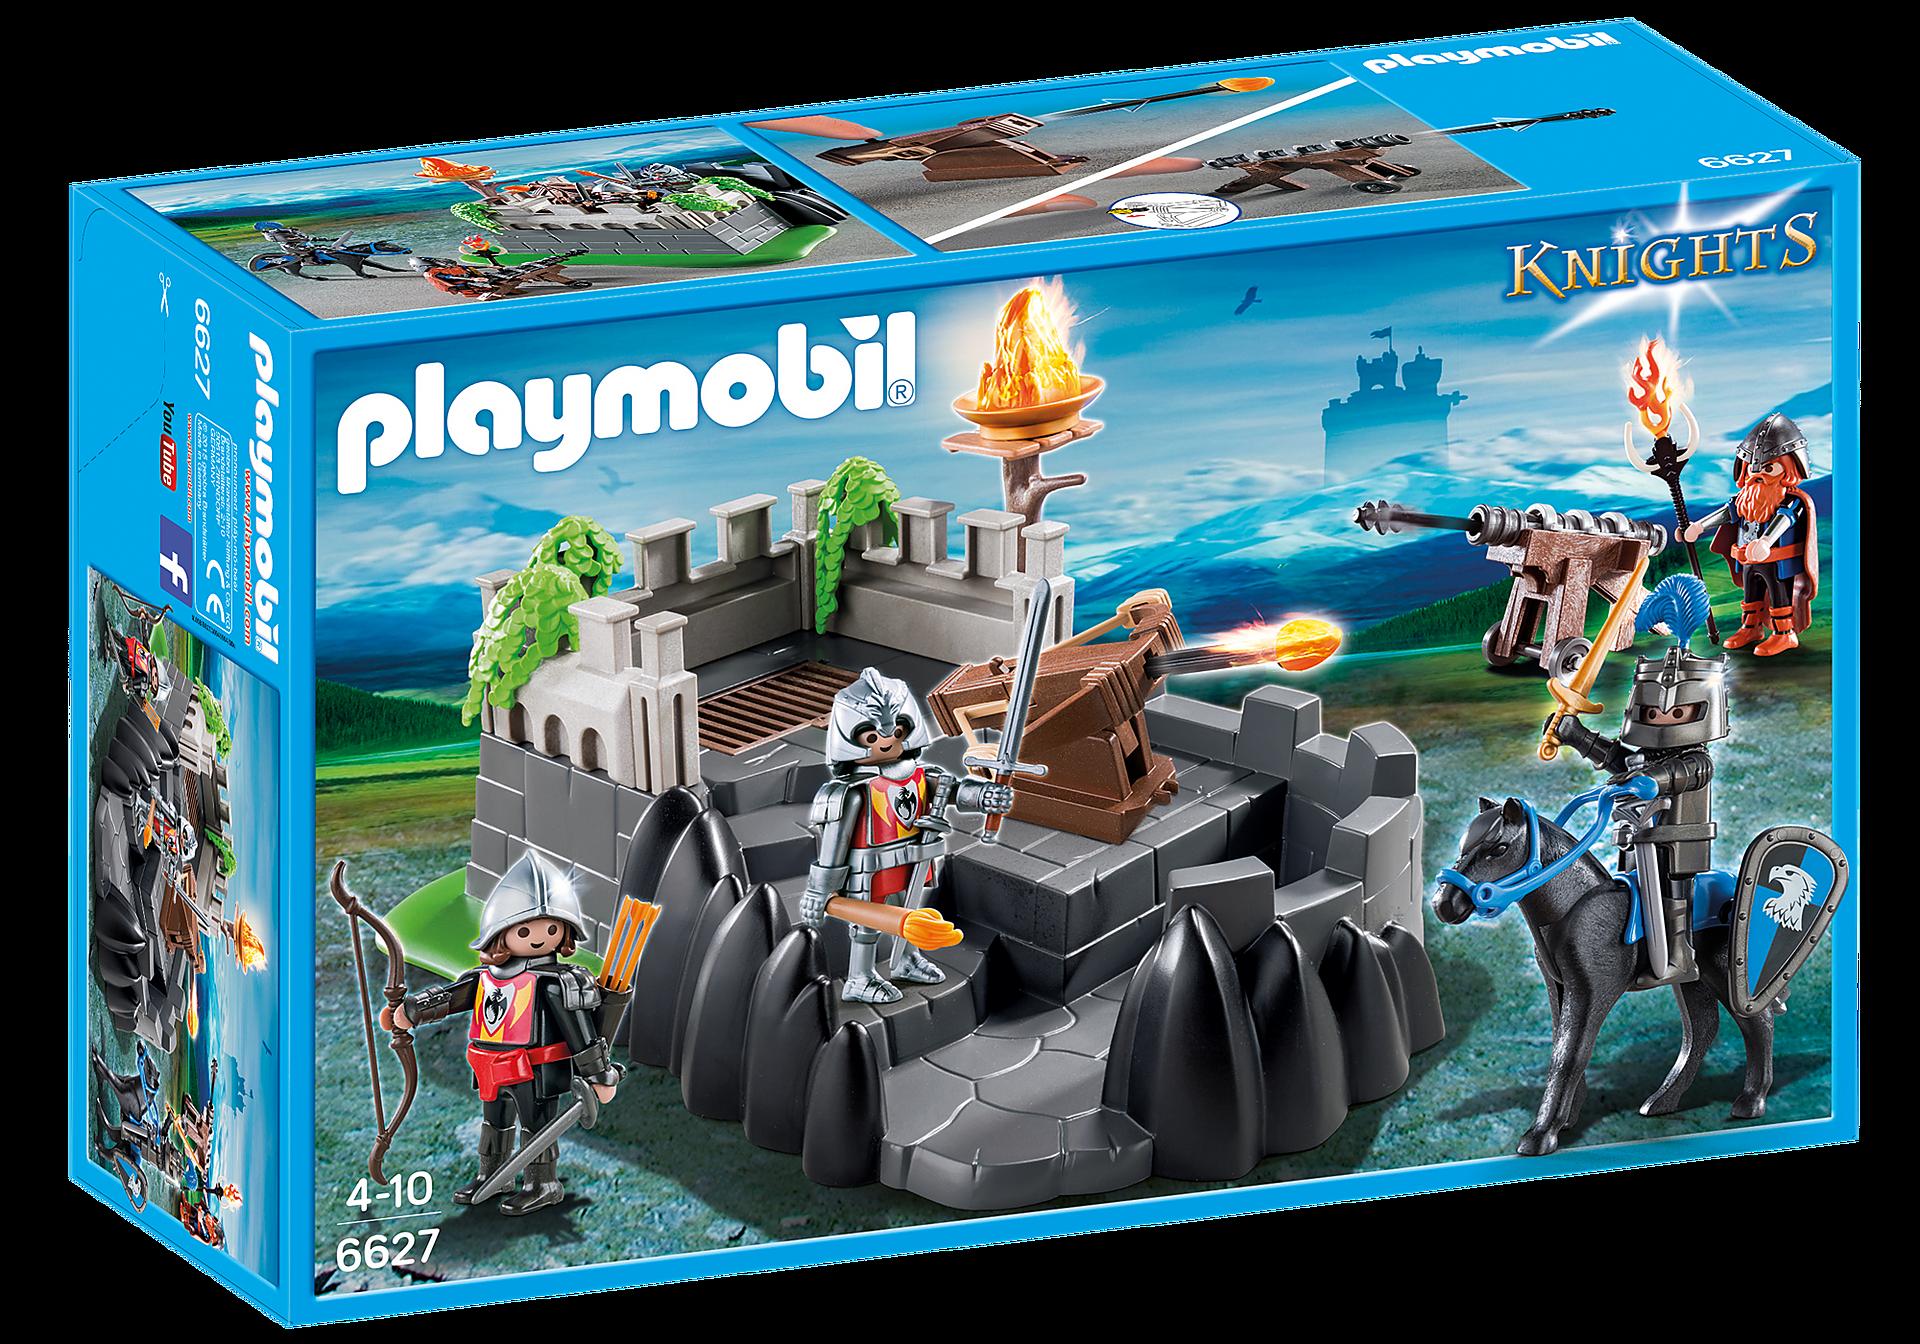 http://media.playmobil.com/i/playmobil/6627_product_box_front/Dragon Knights' Fort